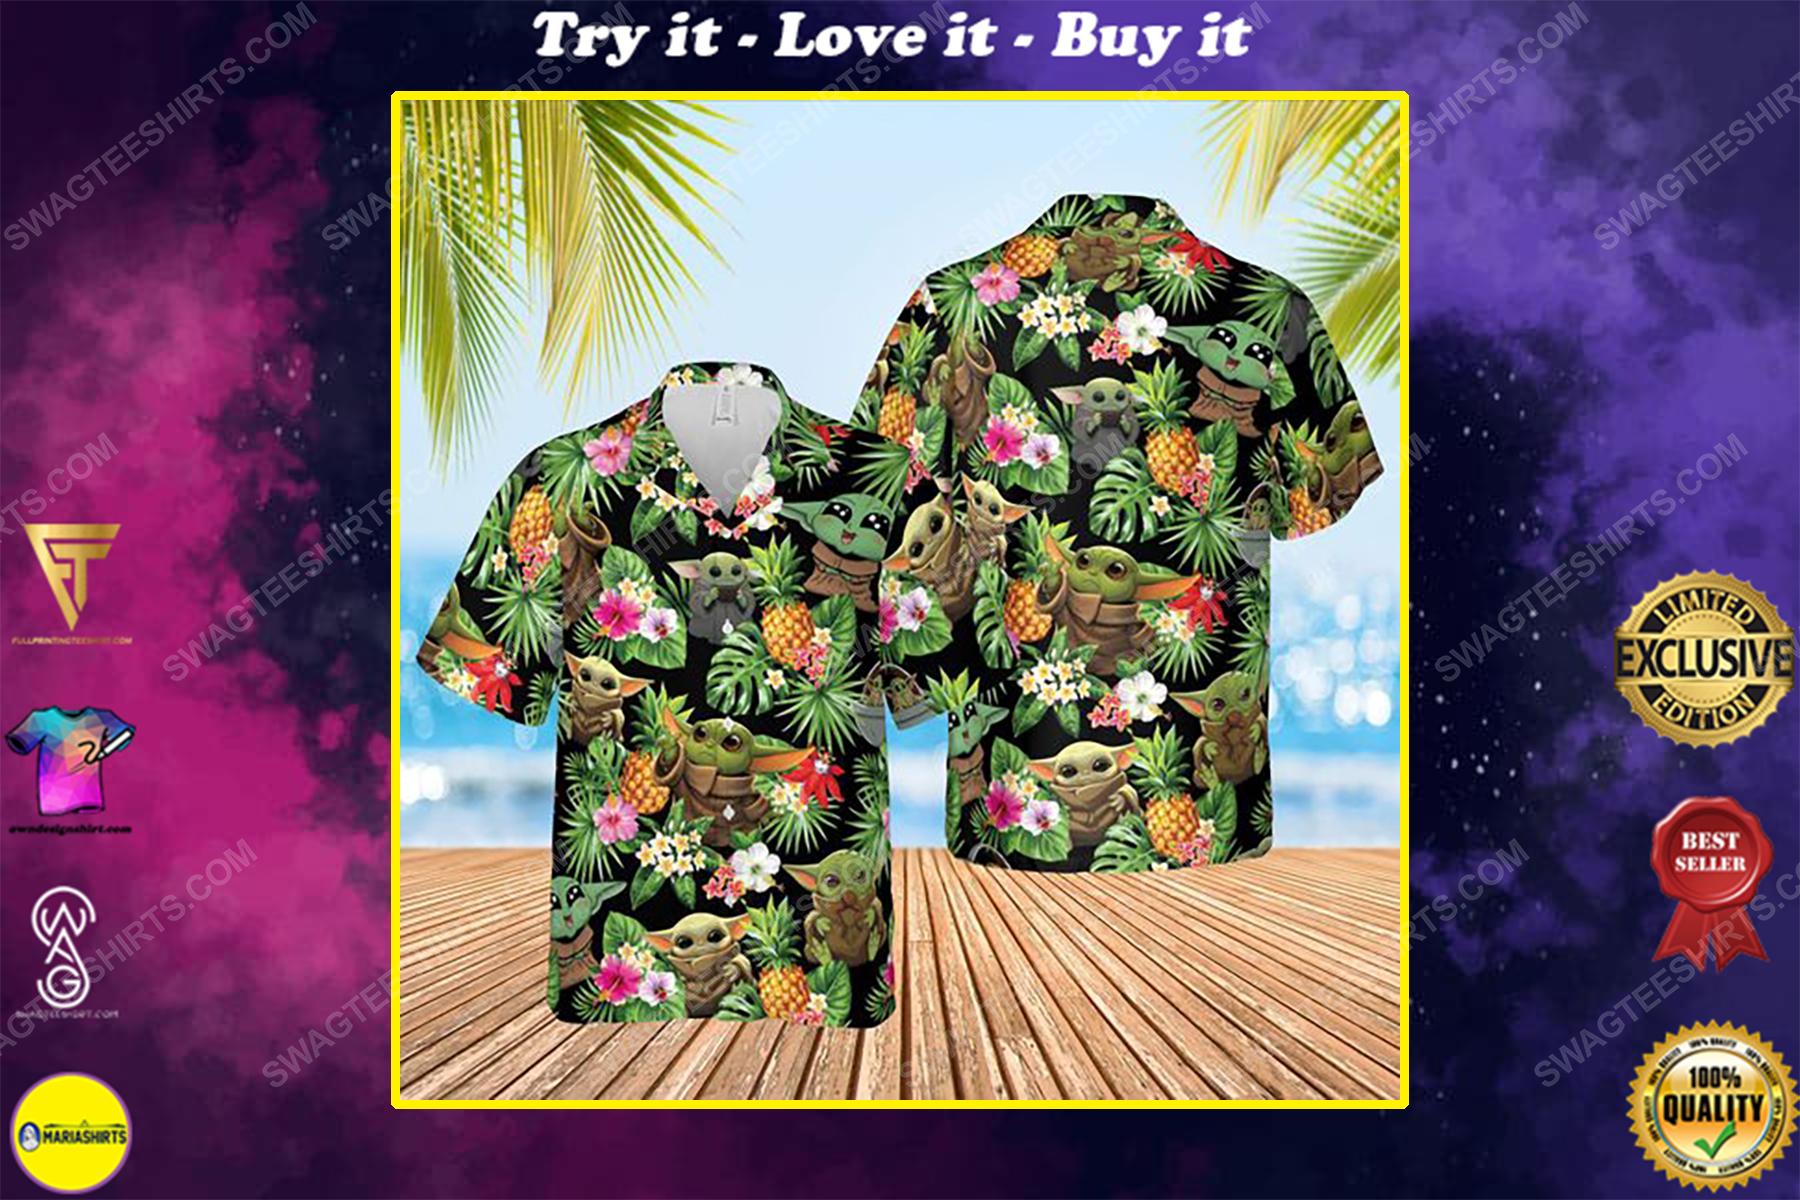 Star wars baby yoda the mandalorian summer vacation hawaiian shirt